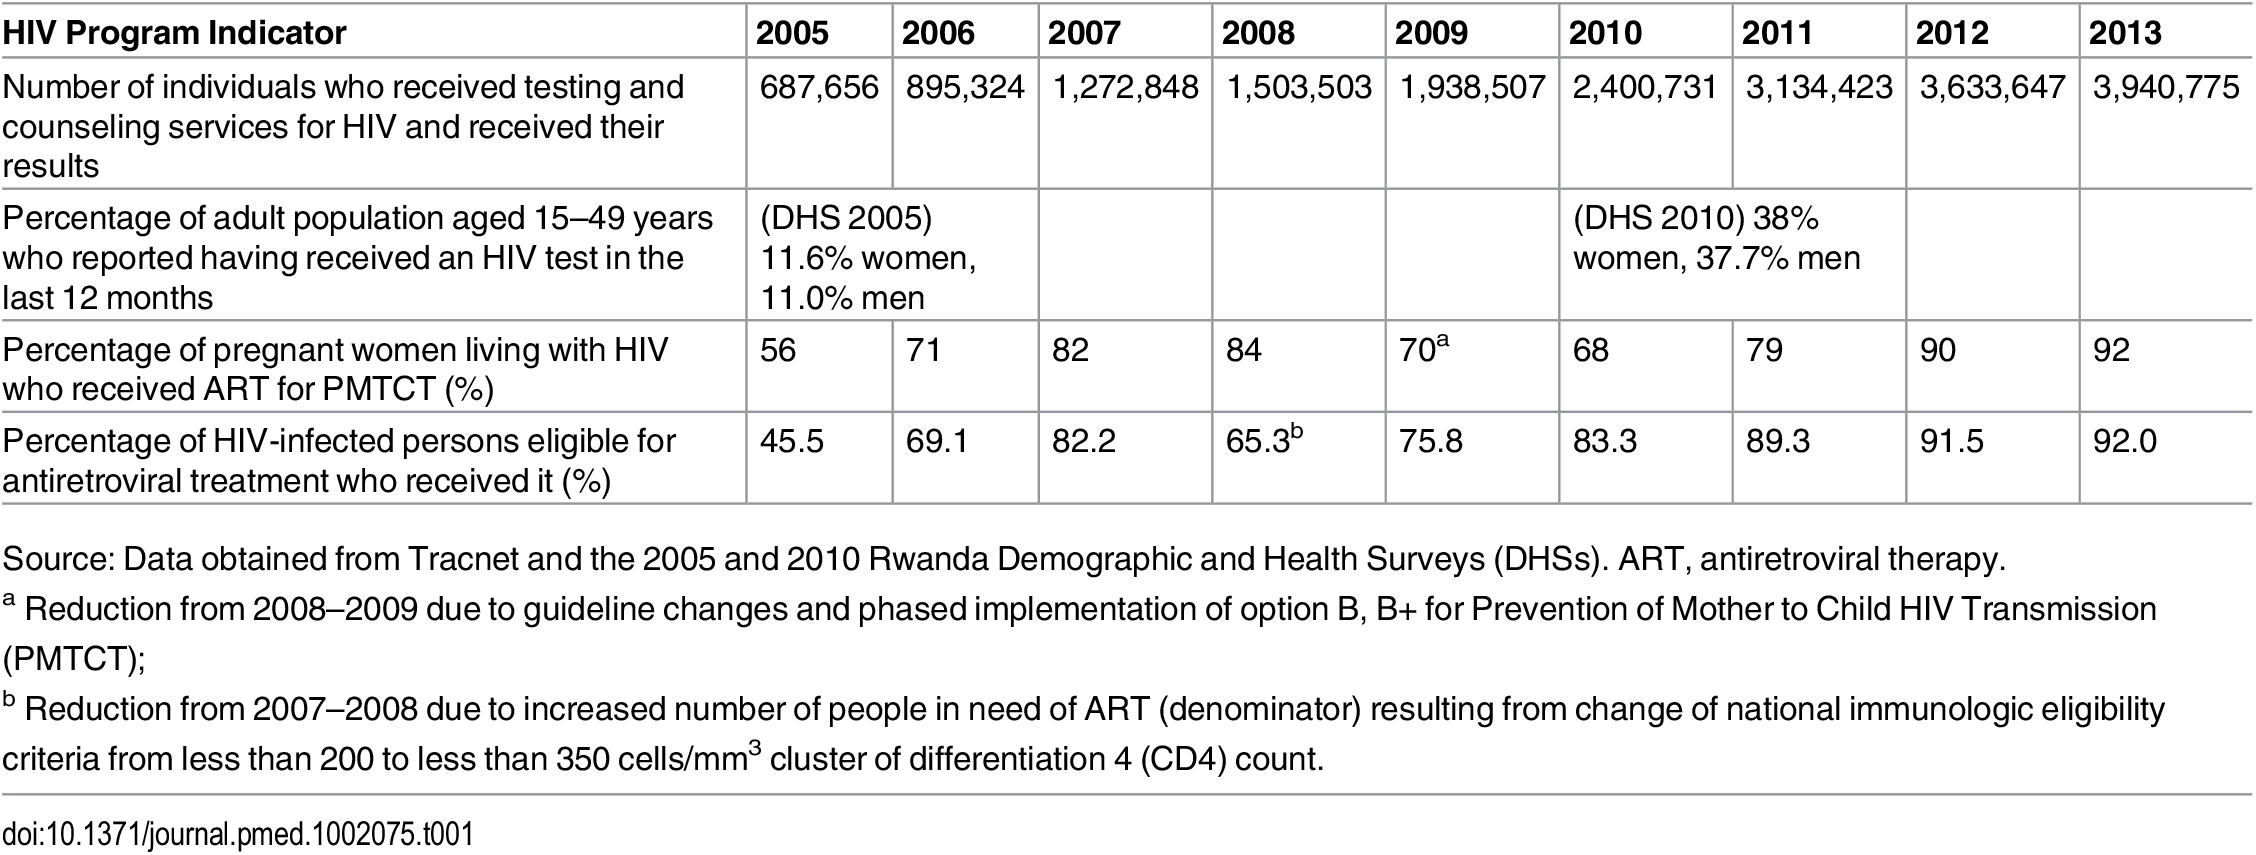 Key HIV Program Indicators in Rwanda, 2005–2013.